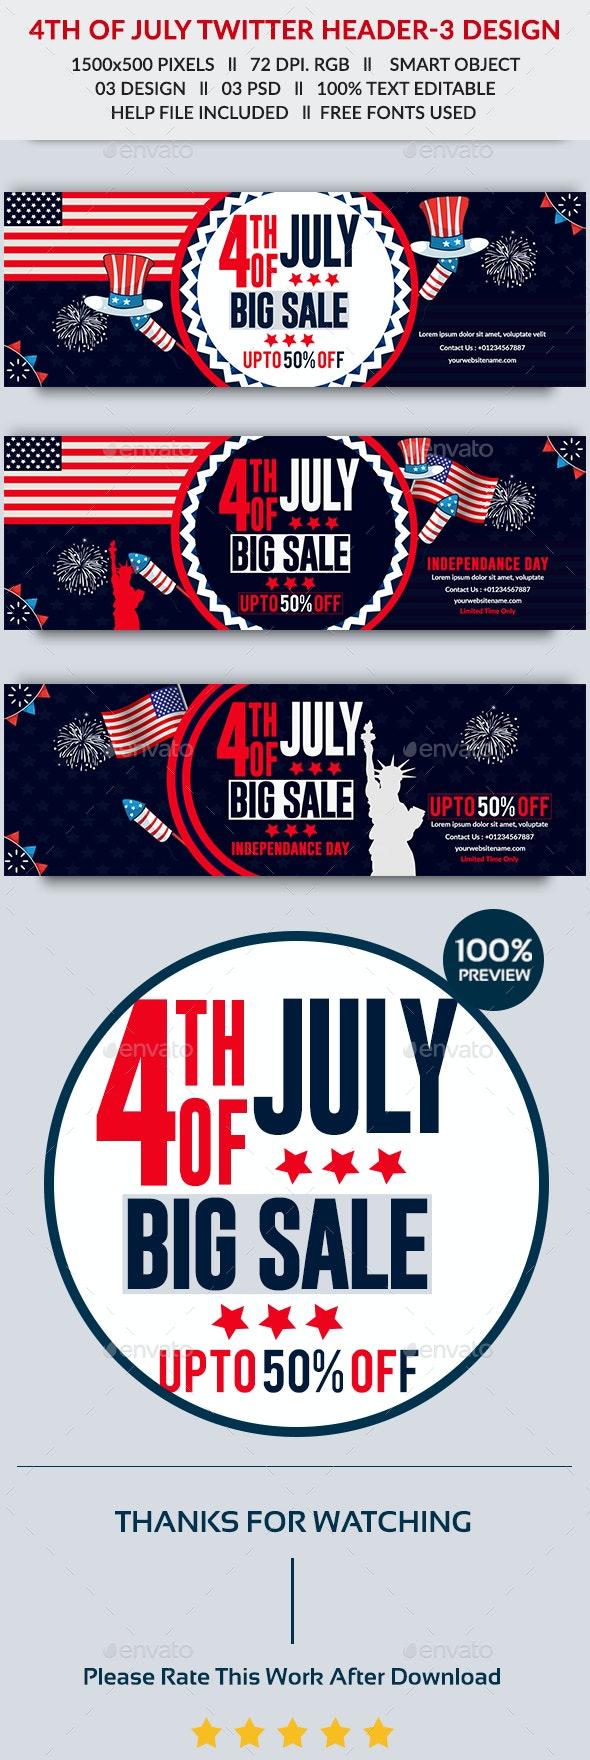 4th of July Twitter Header-3 Design- Image Included - Twitter Social Media